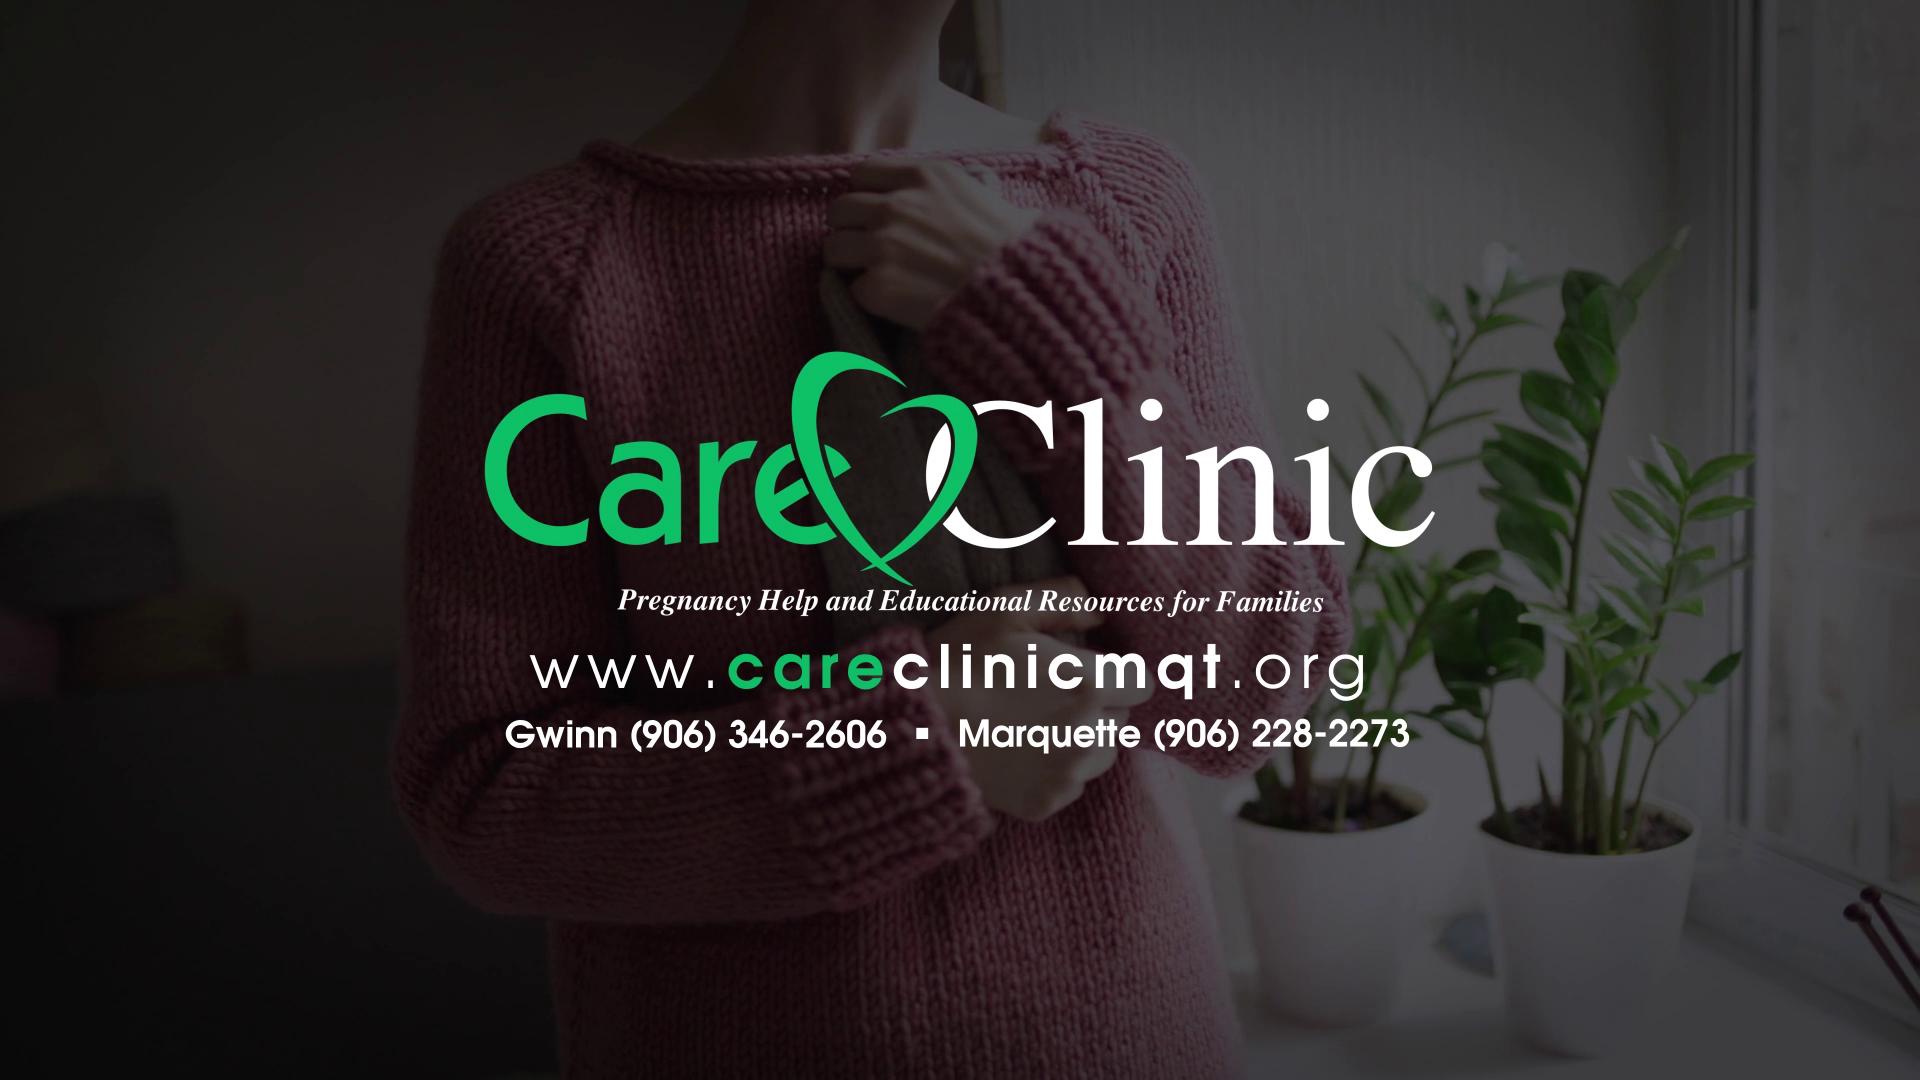 CareClinic